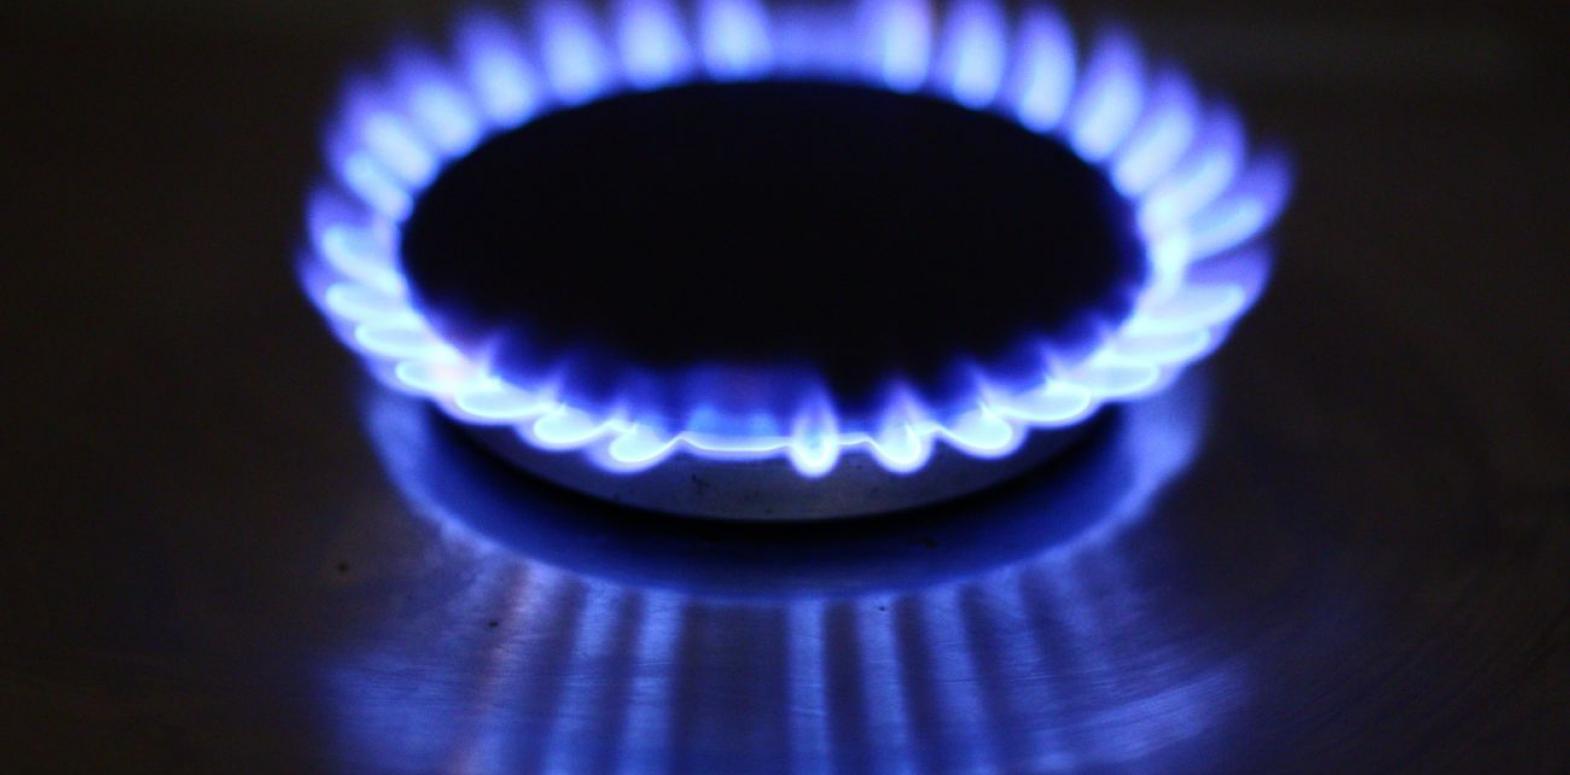 Цена на газ: регулятор одобрил введение годового продукта с 1 мая